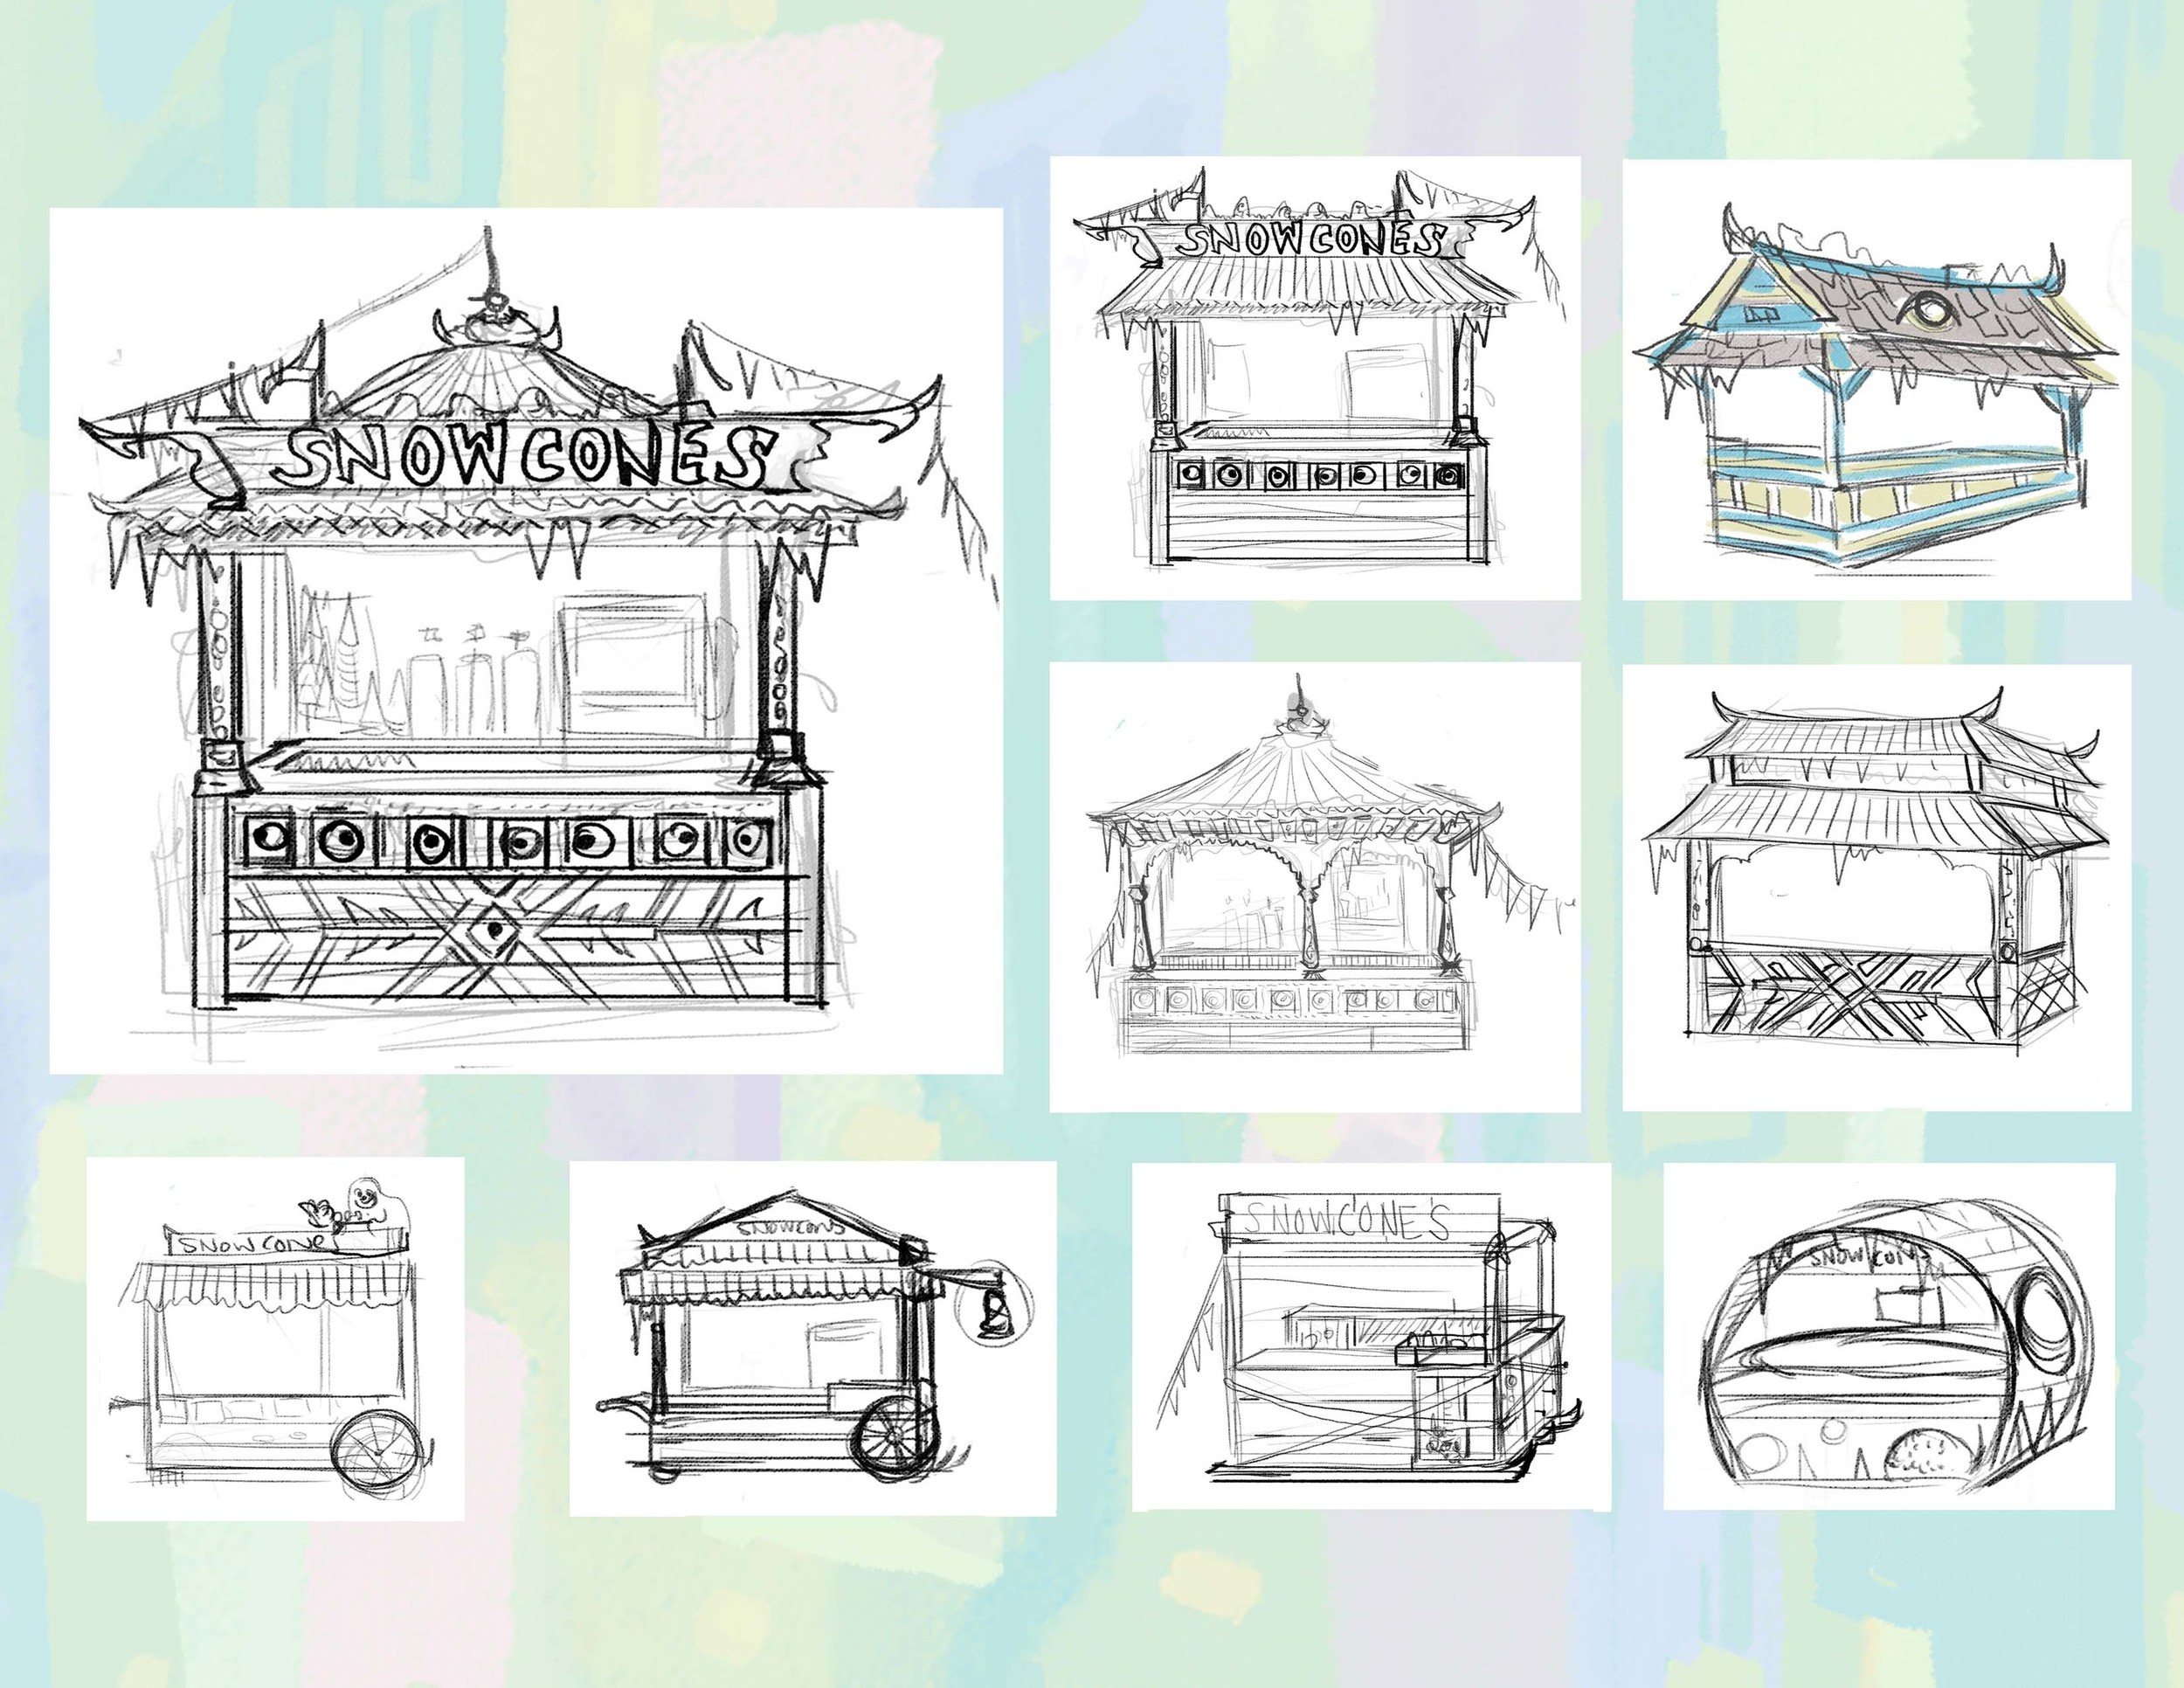 Copy of Snow cone kiosk designs